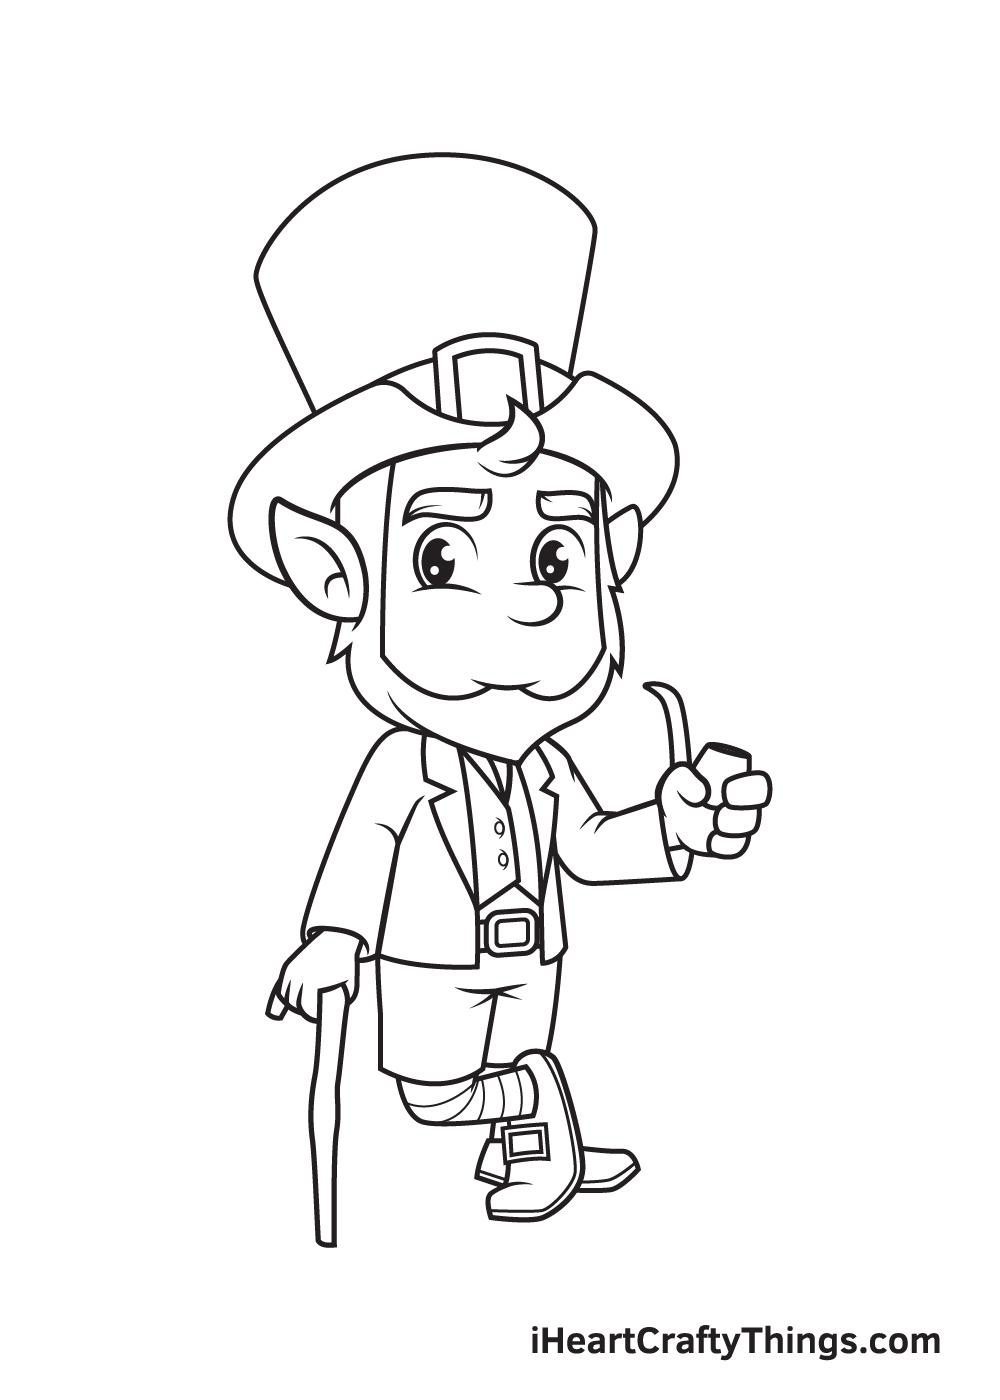 Leprechaun Drawing – Step 8